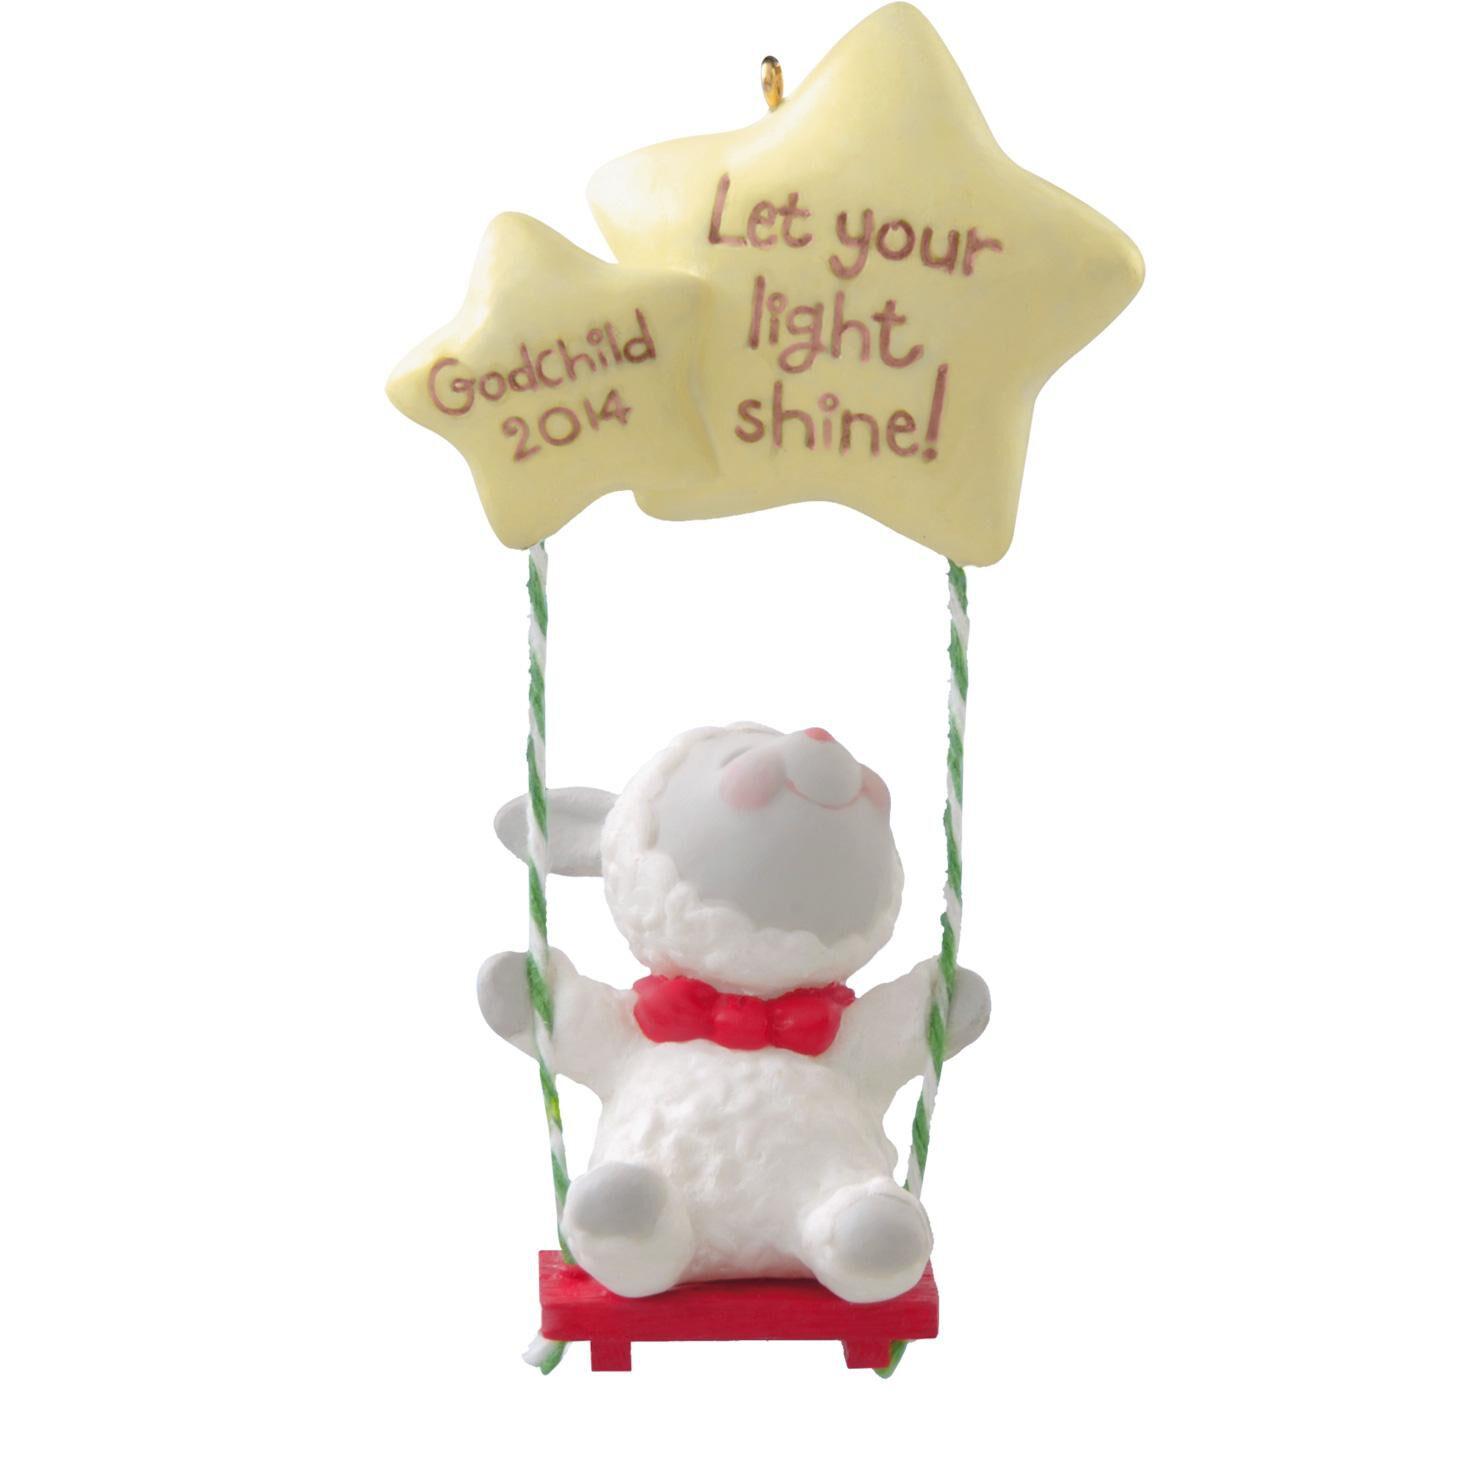 Godchild  Keepsake Ornaments  Hallmark